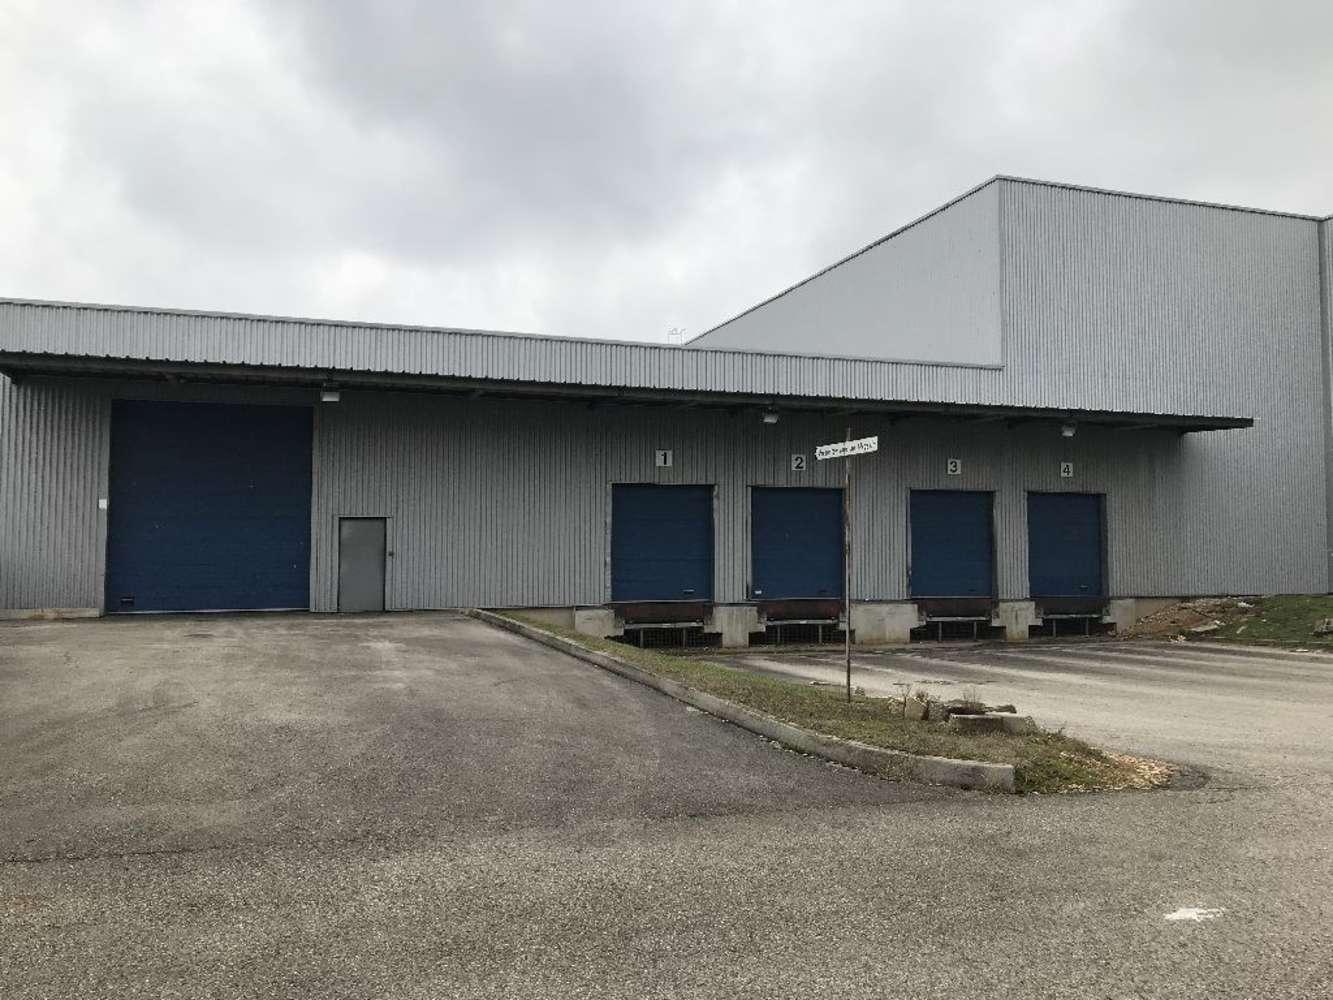 Activités/entrepôt Genas, 69740 - Location entrepot Genas / Lyon Est - 10319660